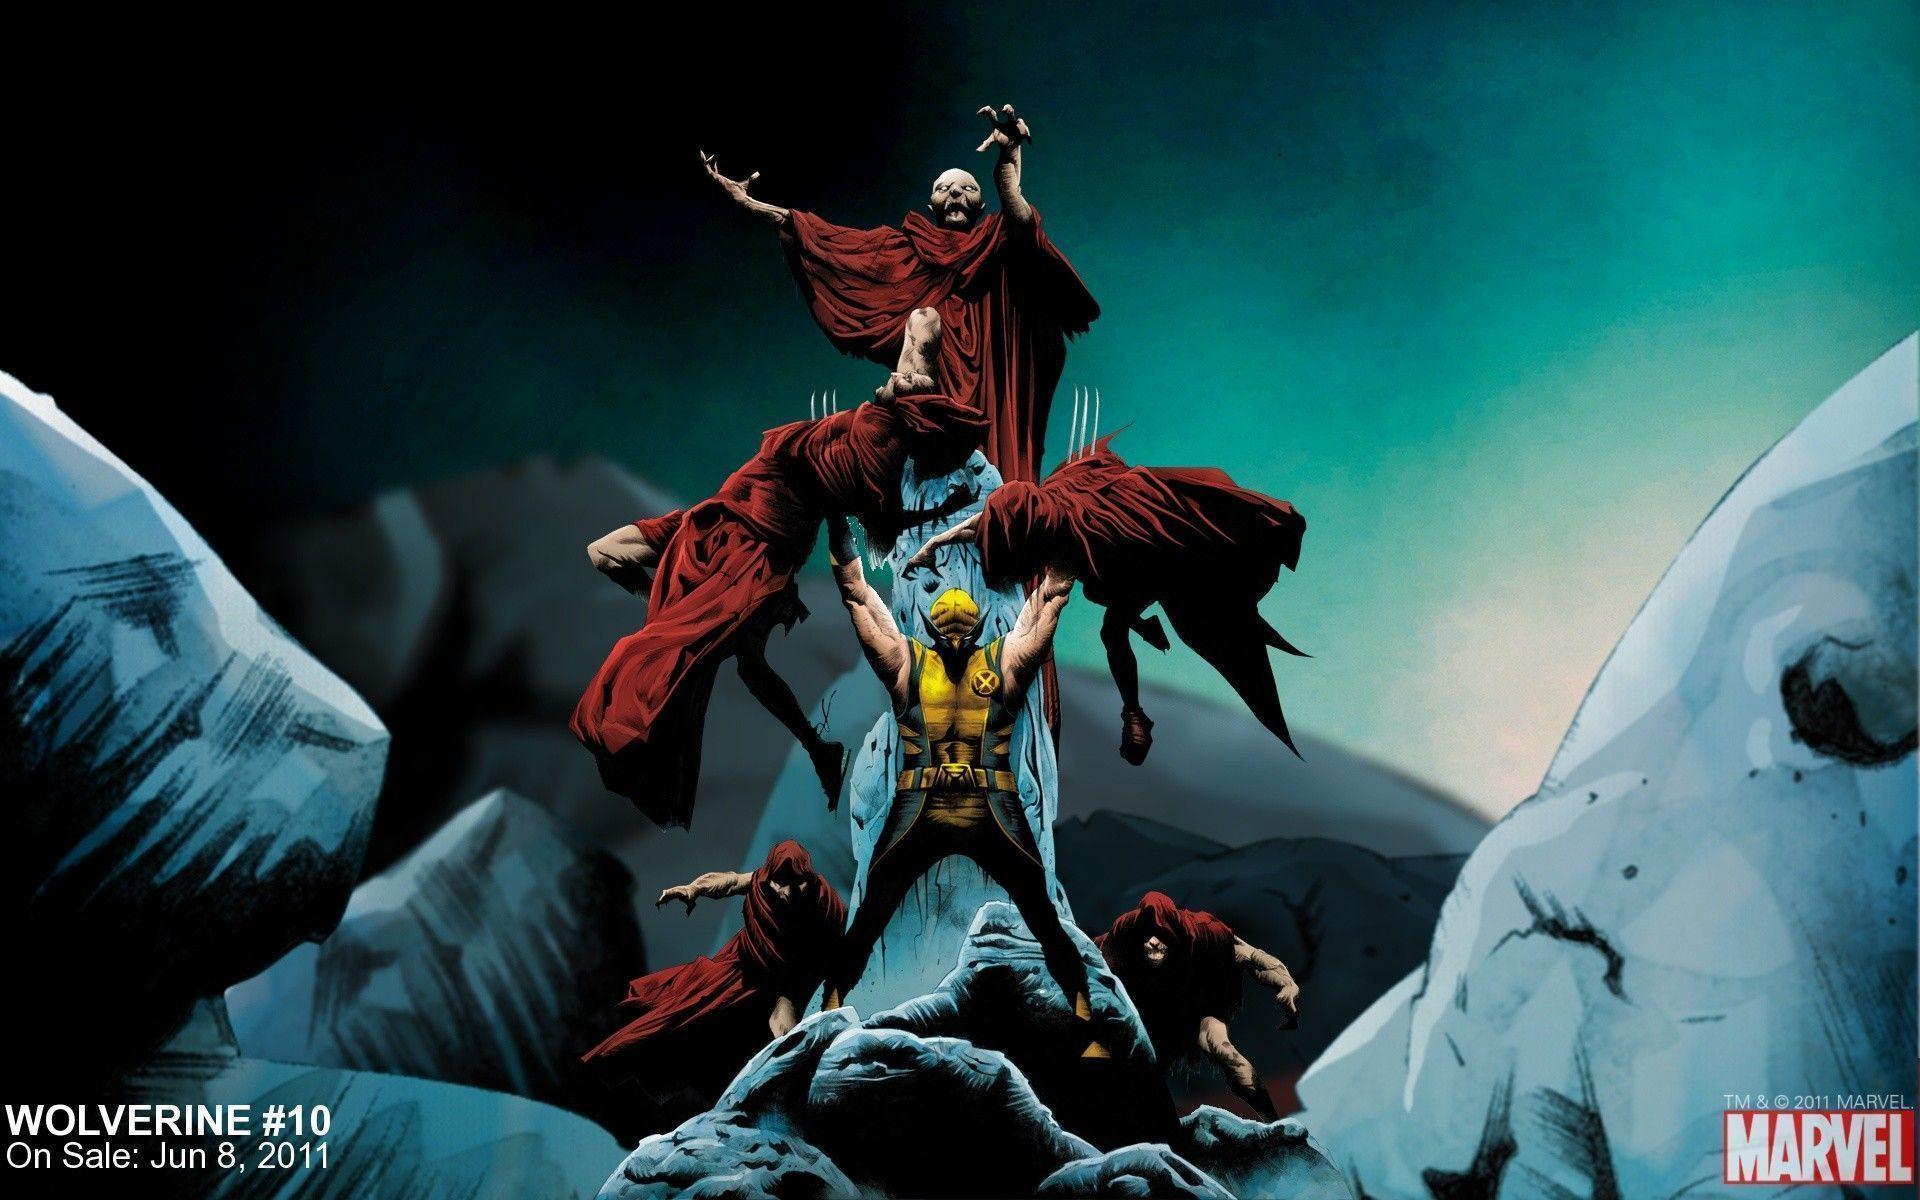 Dc vs marvel wallpapers wallpaper cave - Marvel android wallpaper hd ...